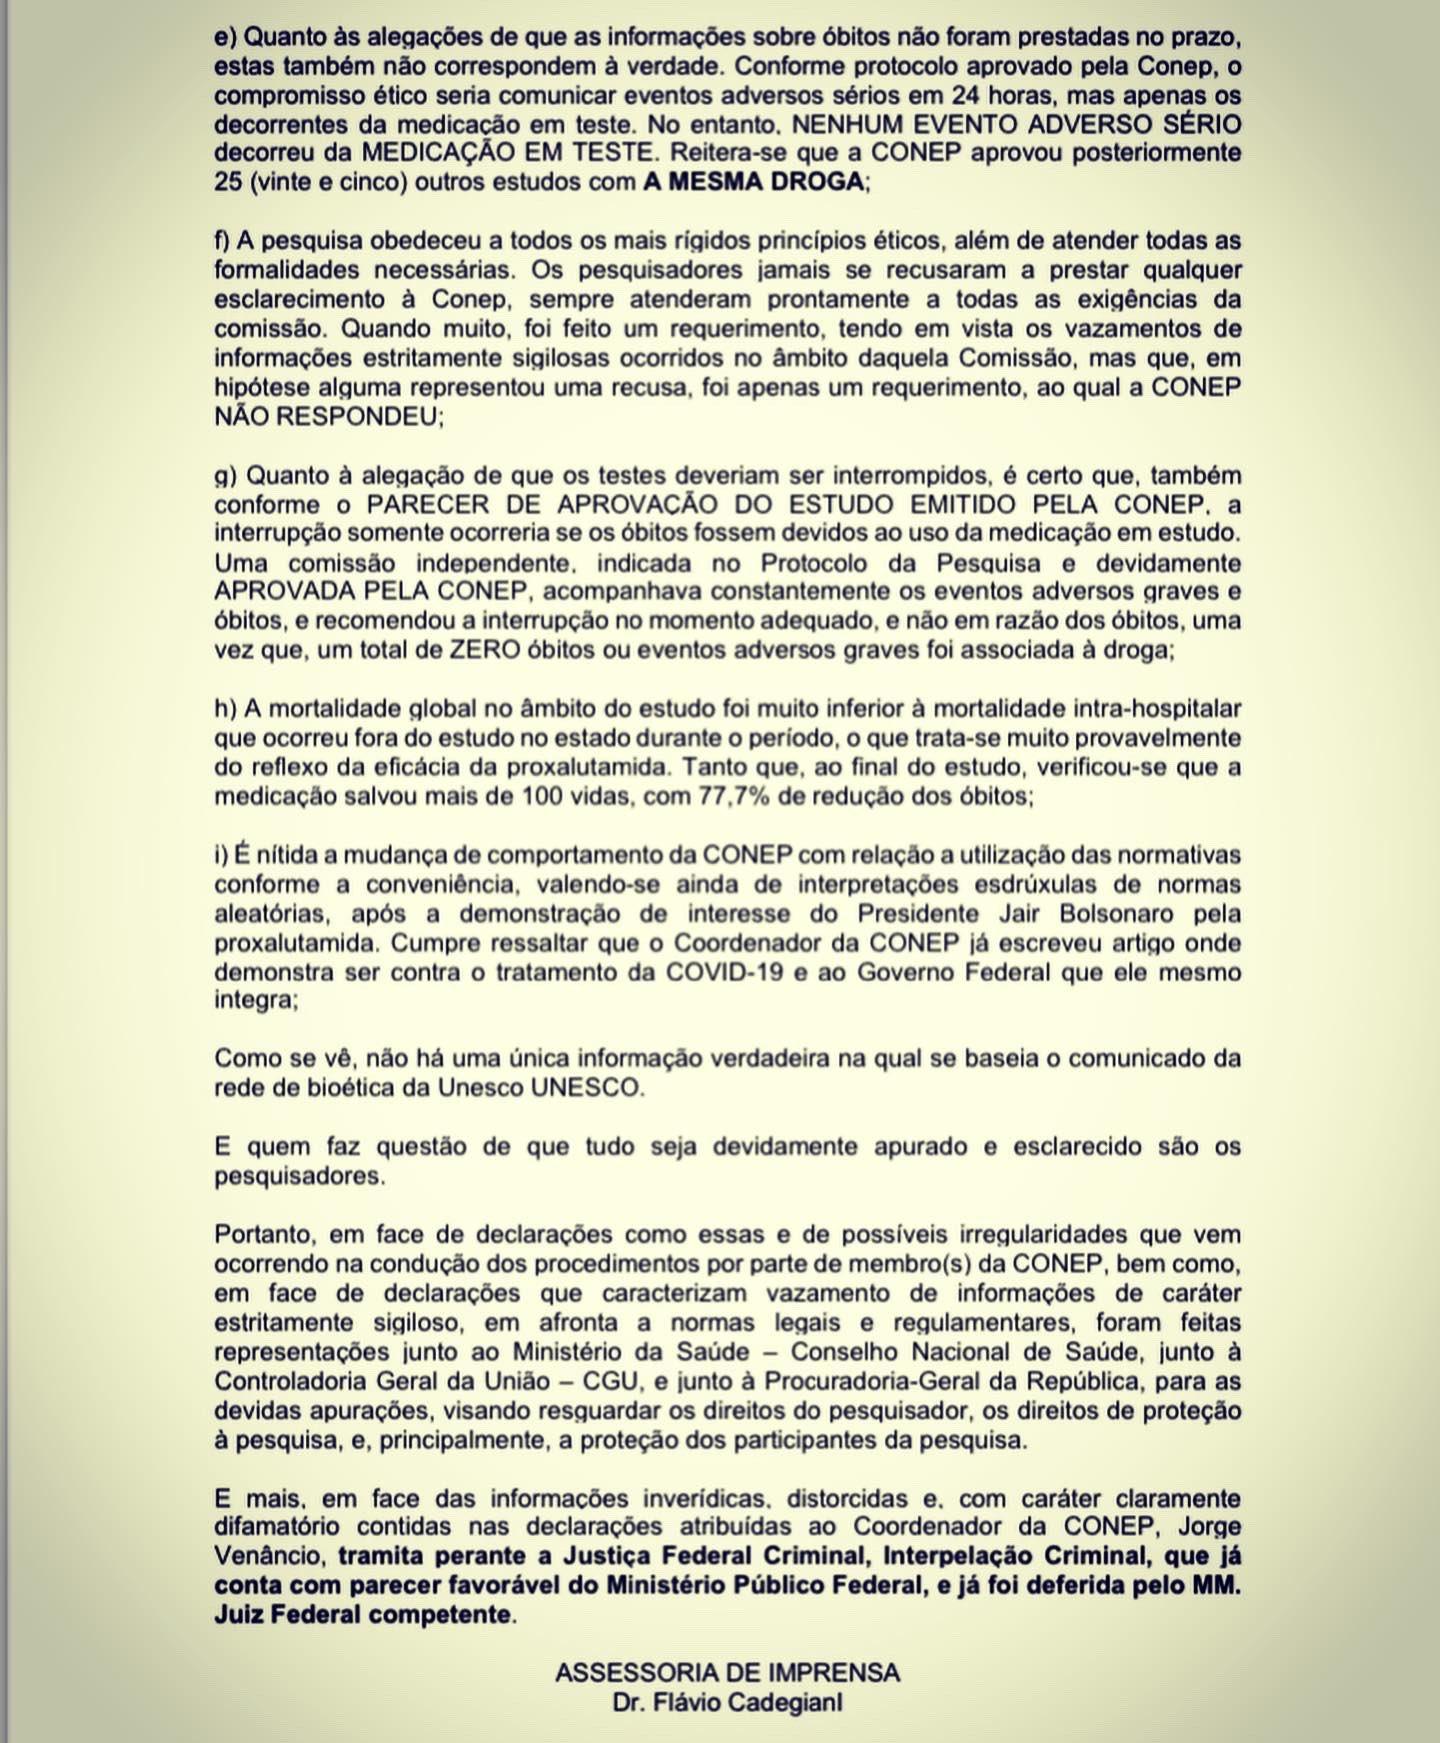 nota flavio cadegiani pagina 2